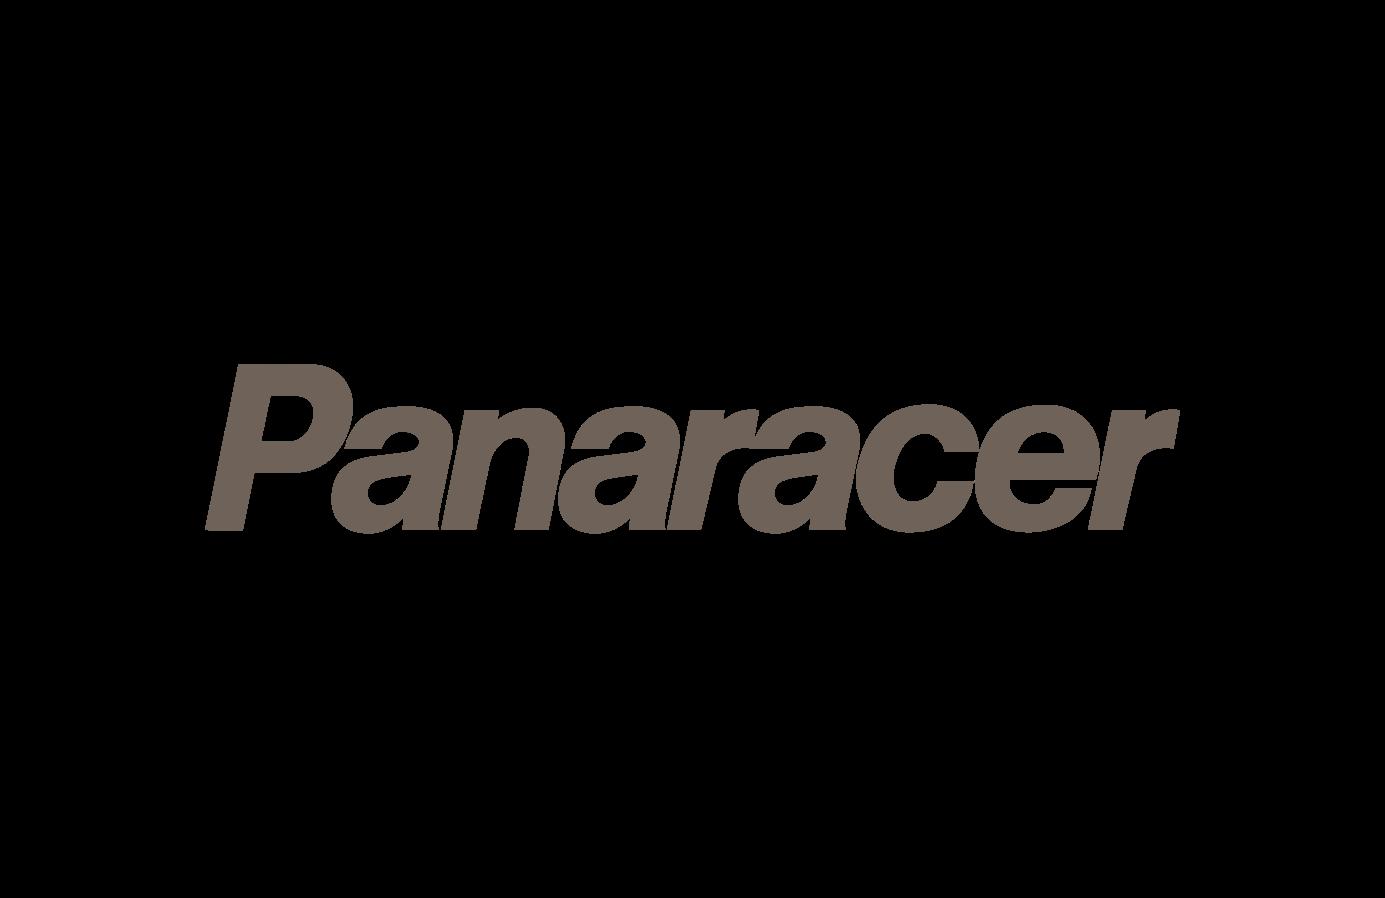 panaracer sq.png